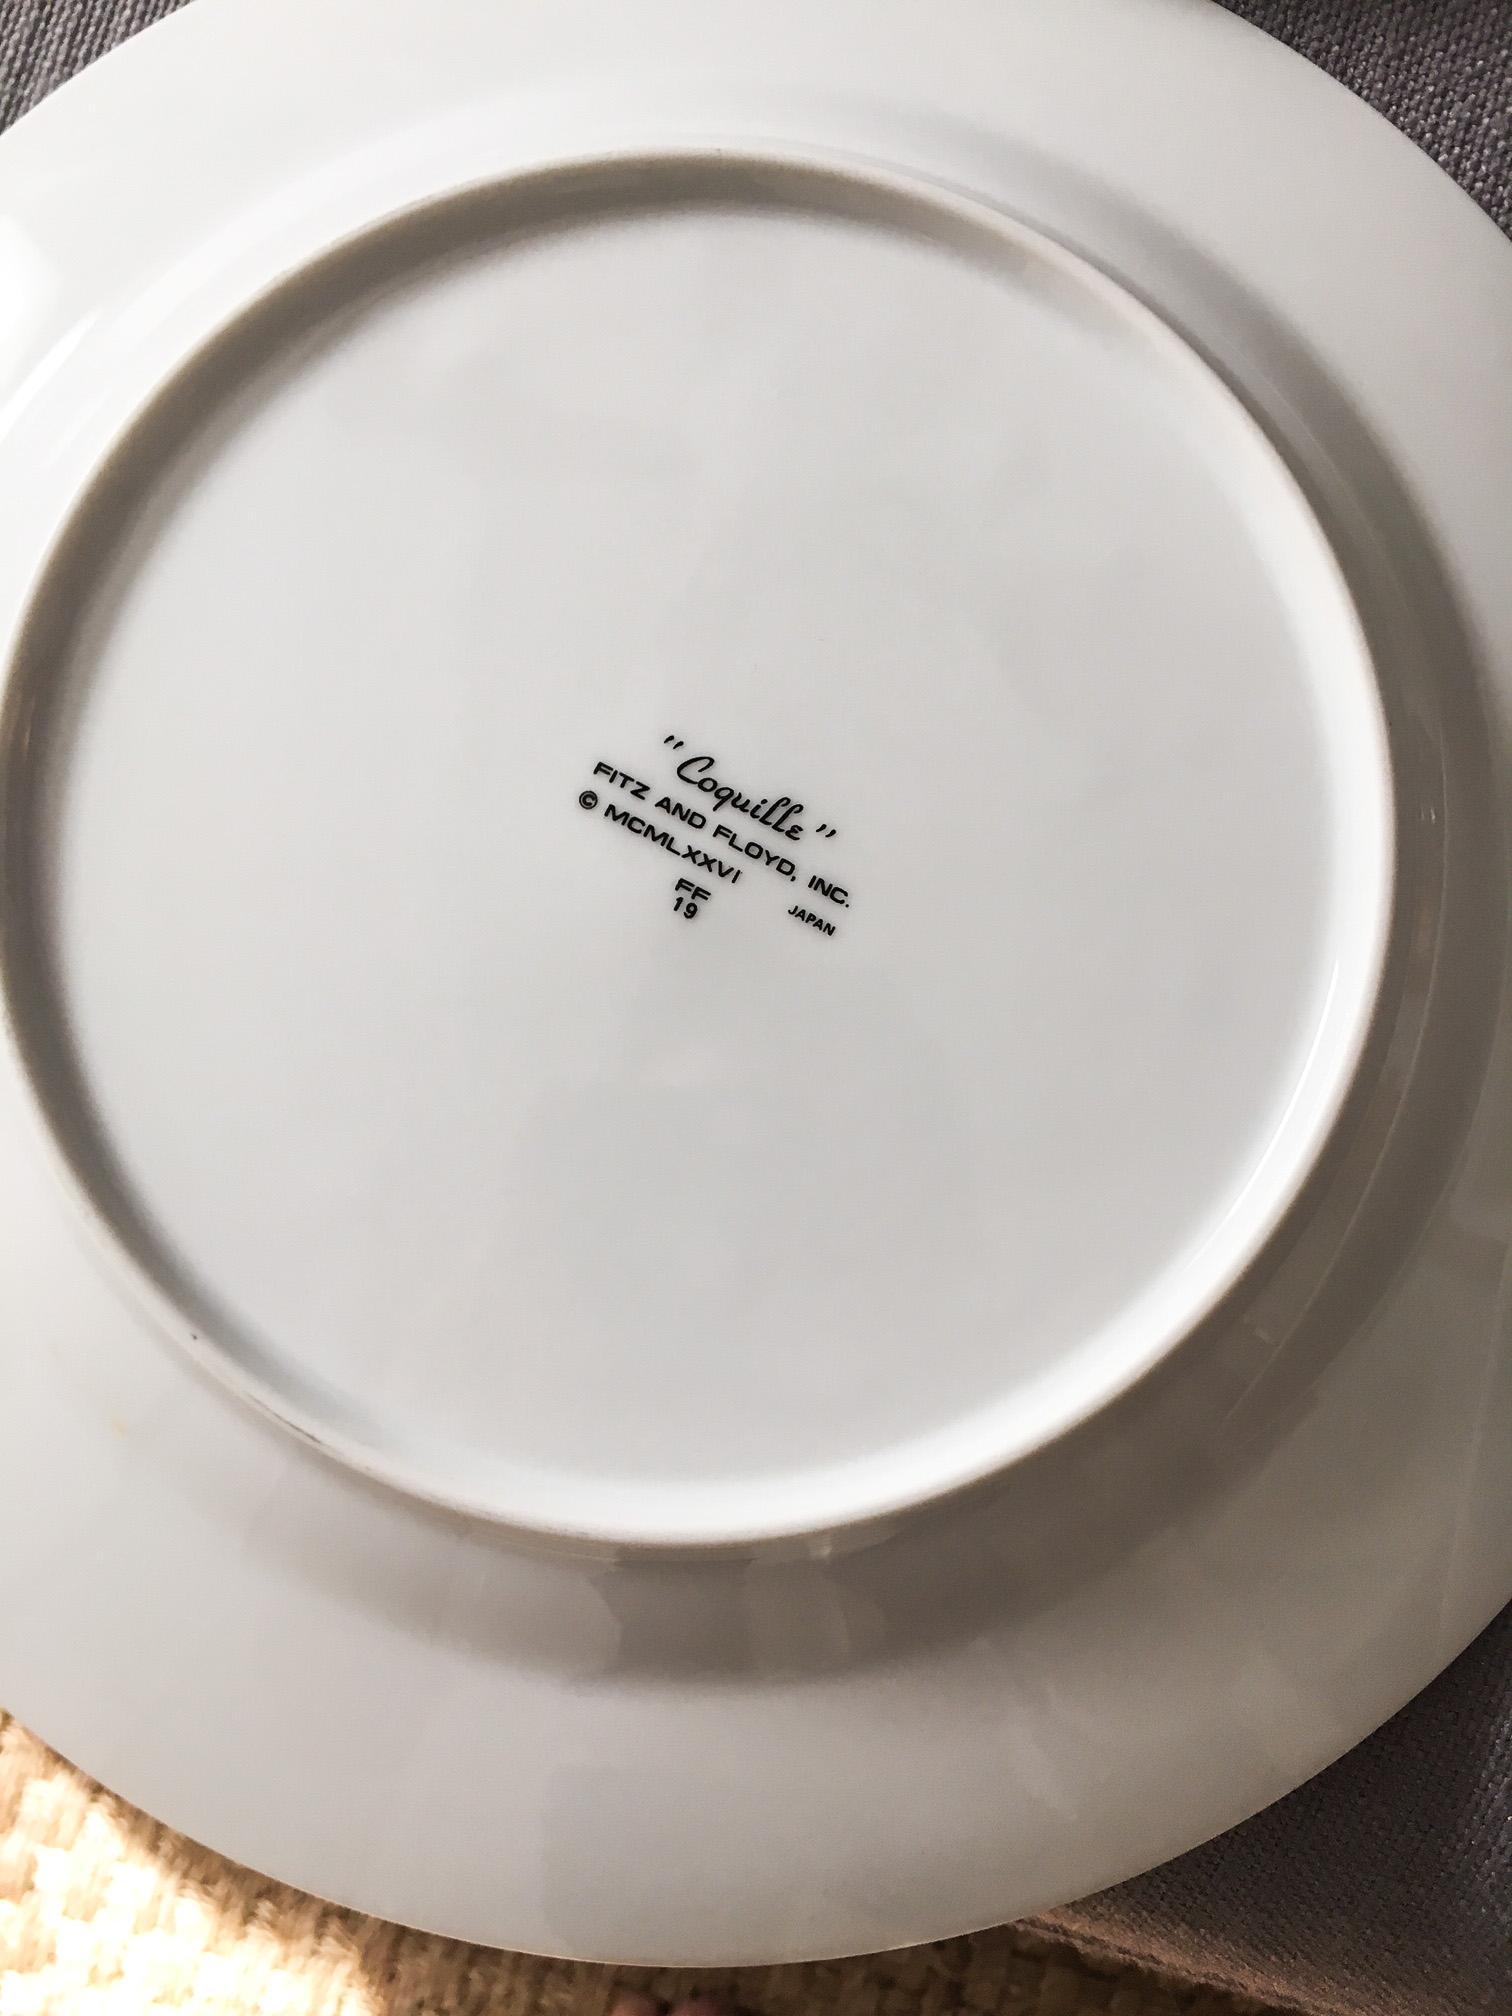 Fitz \u0026 Floyd Coquille Nautical Dinner Plates - Set of 8 - Image 6 ...  sc 1 st  Chairish & Fitz \u0026 Floyd Coquille Nautical Dinner Plates - Set of 8   Chairish